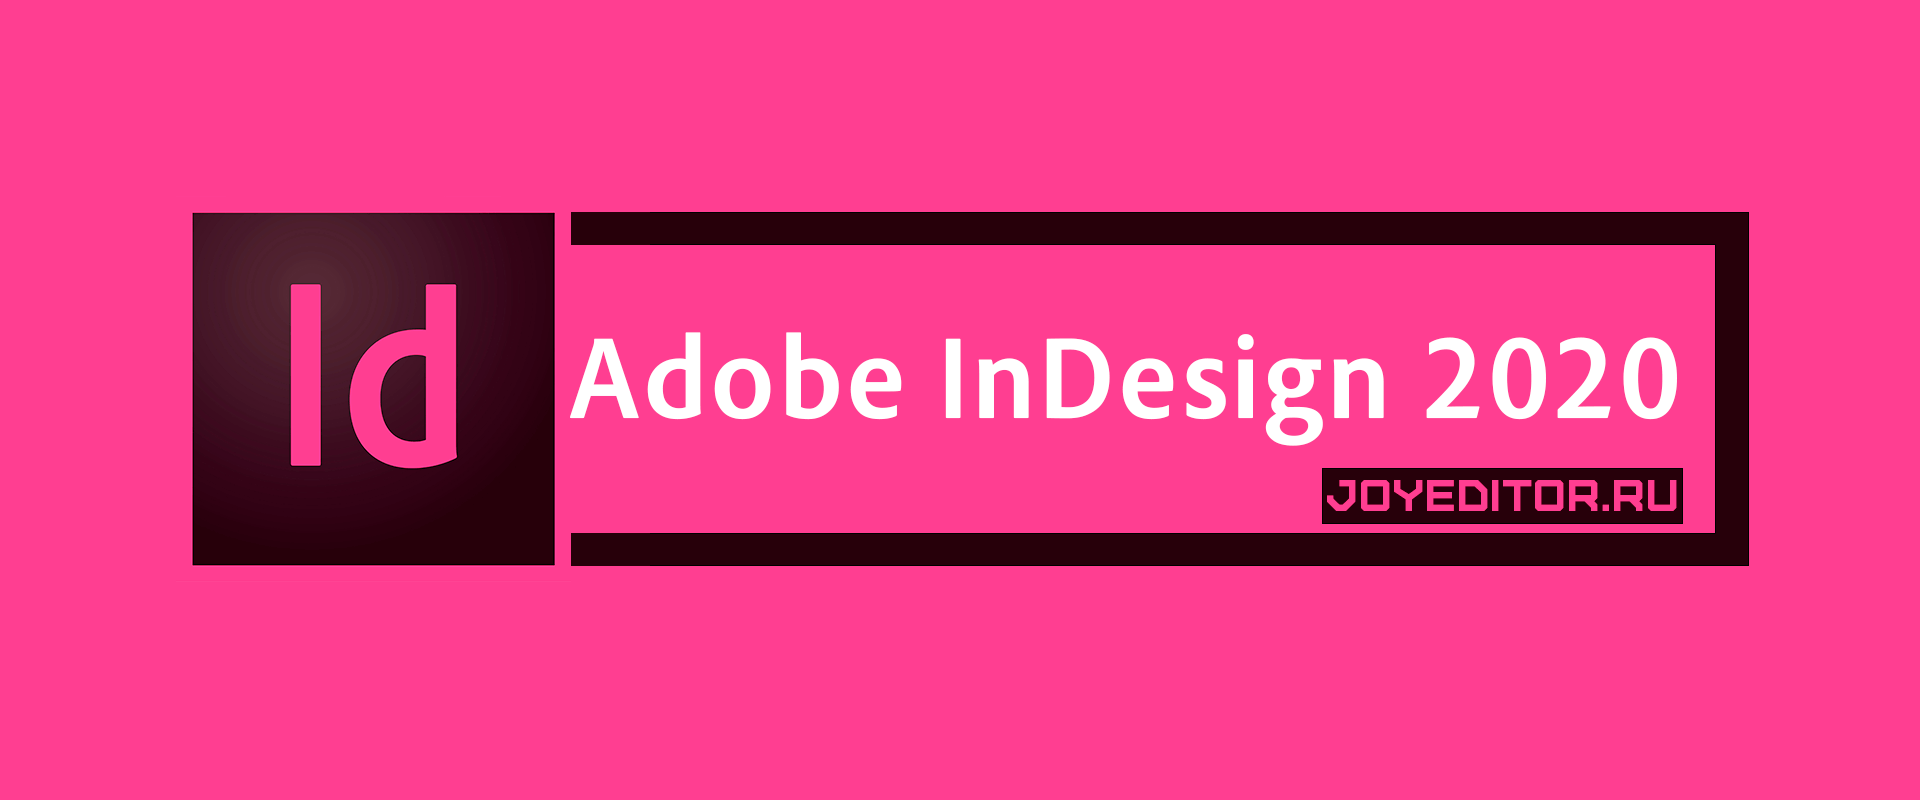 Adobe InDesign 2020